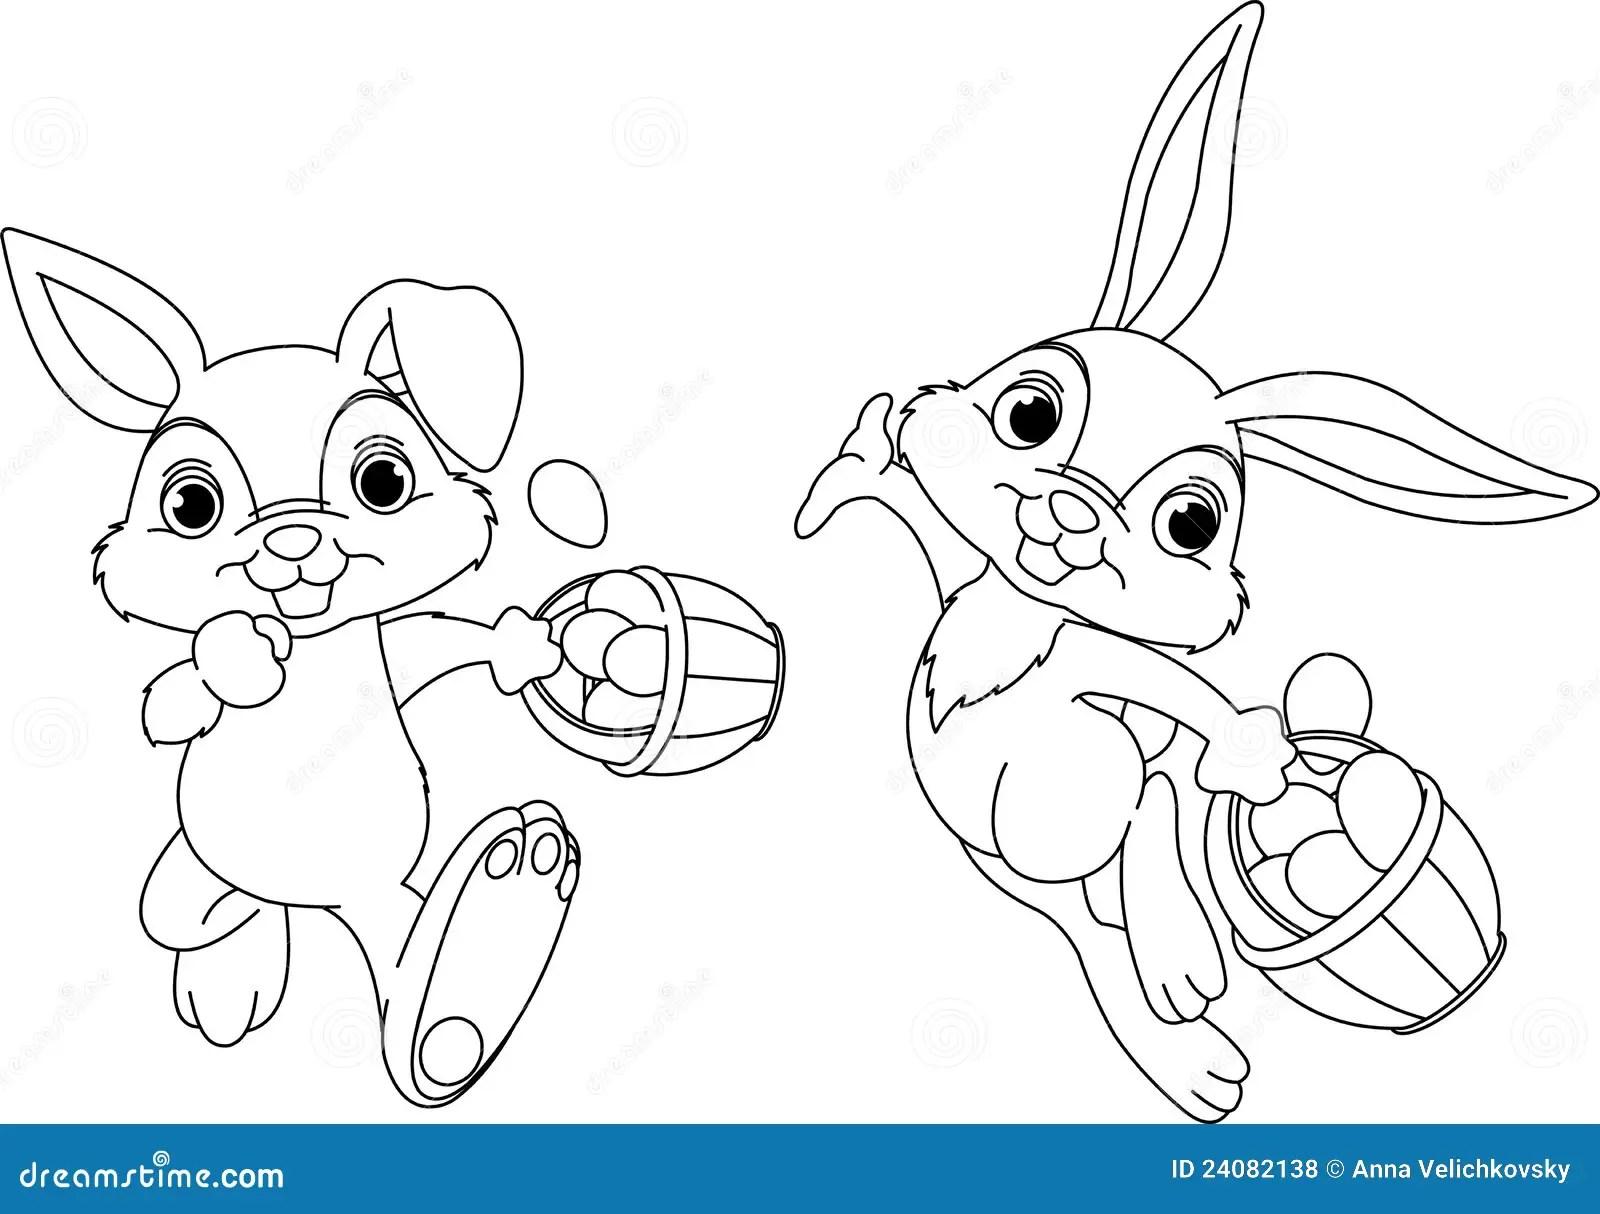 Bunny Hiding Eggs Coloring Page Royalty Free Stock Photos